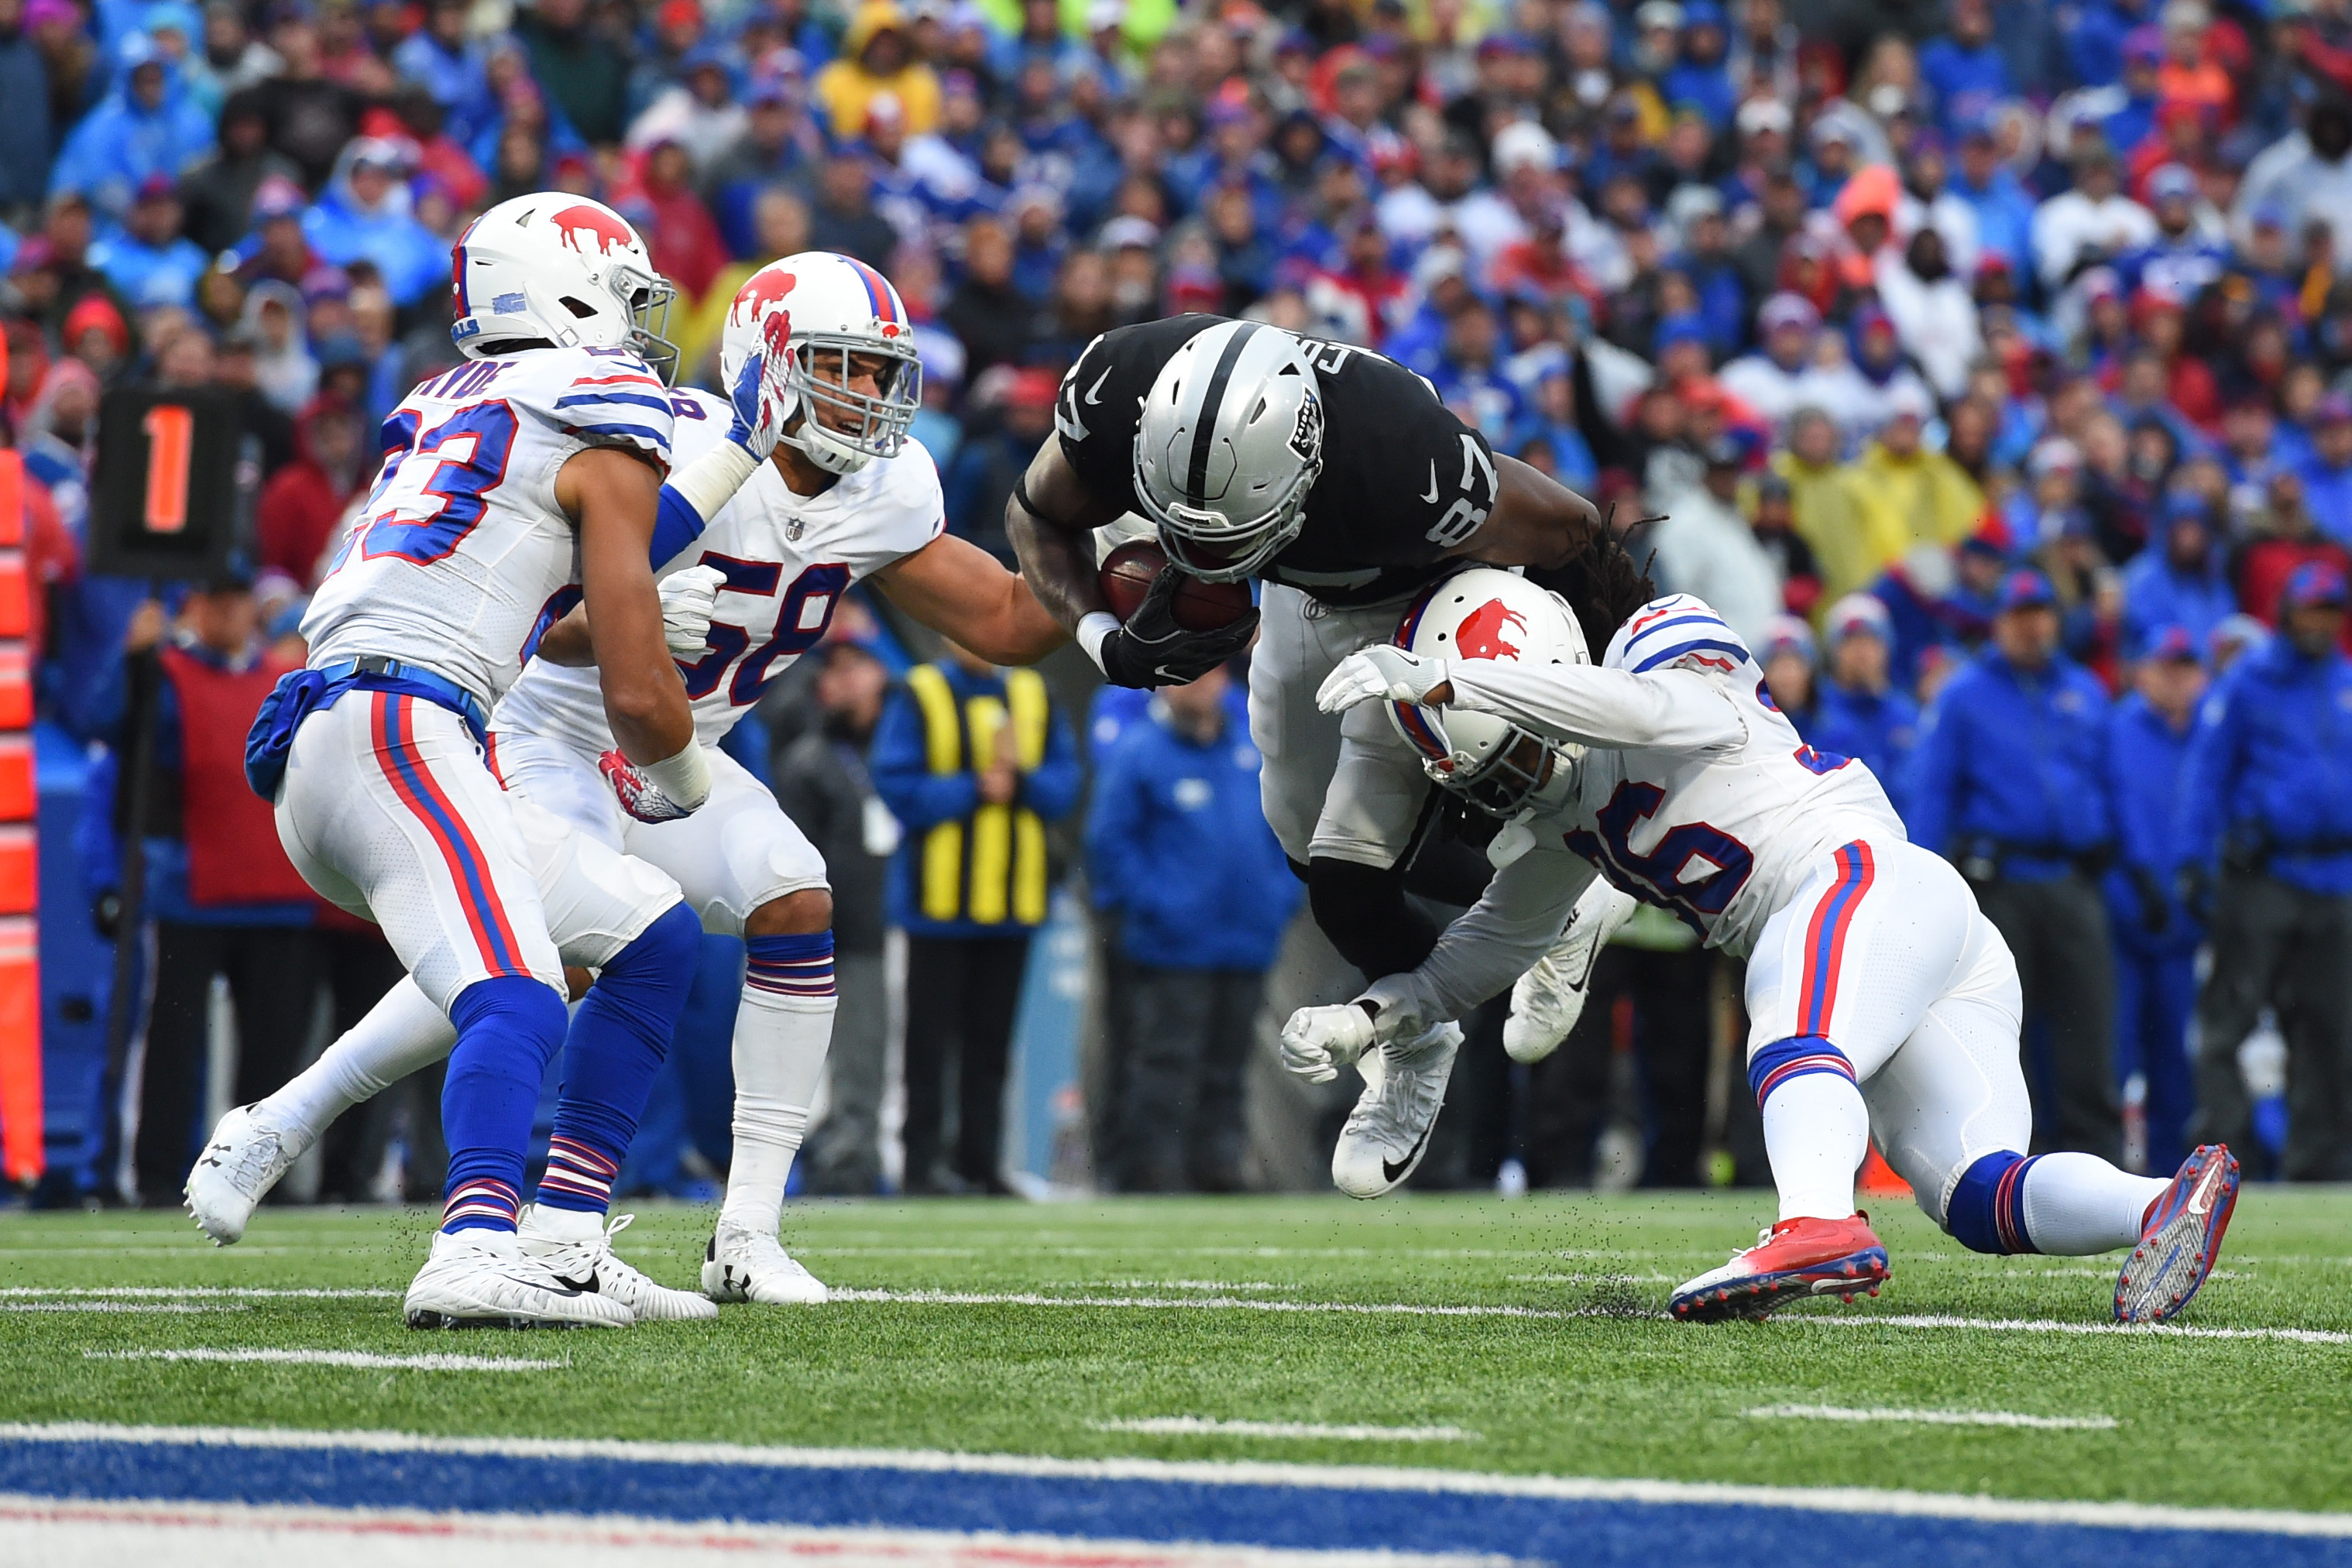 NFL: Oakland Raiders at Buffalo Bills